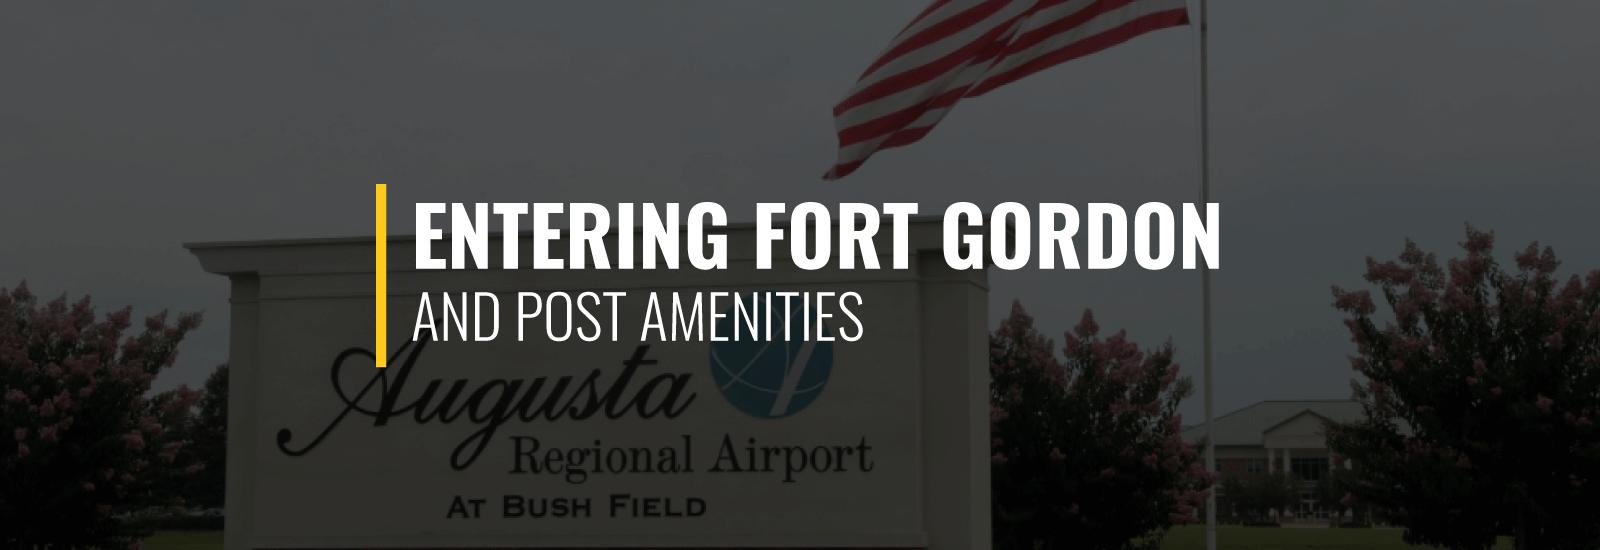 Entering Fort Gordon